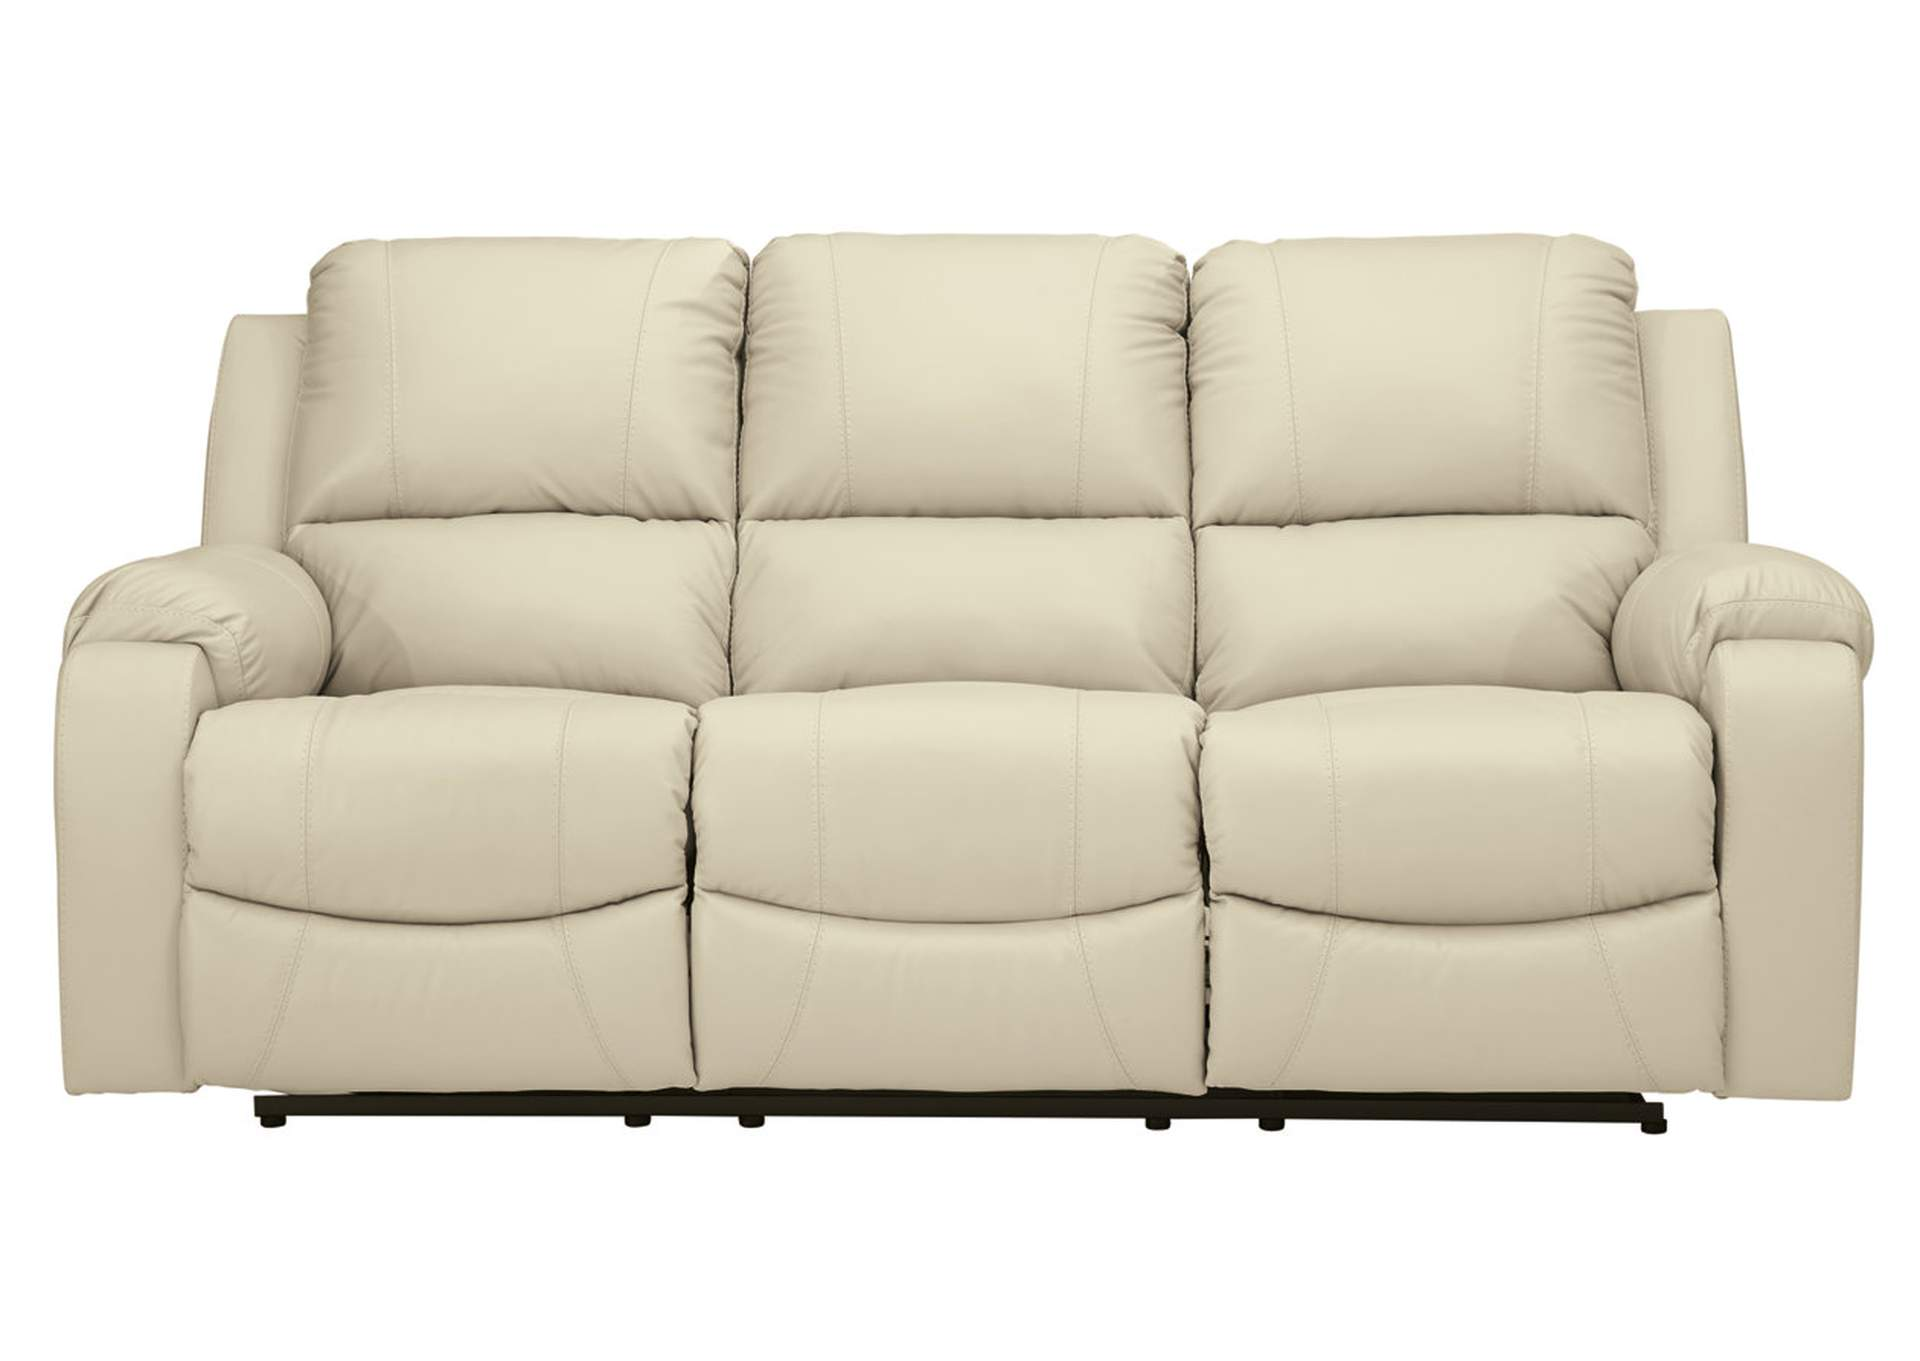 Strange Roses Flooring And Furniture Rackingburg Cream Reclining Sofa Pdpeps Interior Chair Design Pdpepsorg